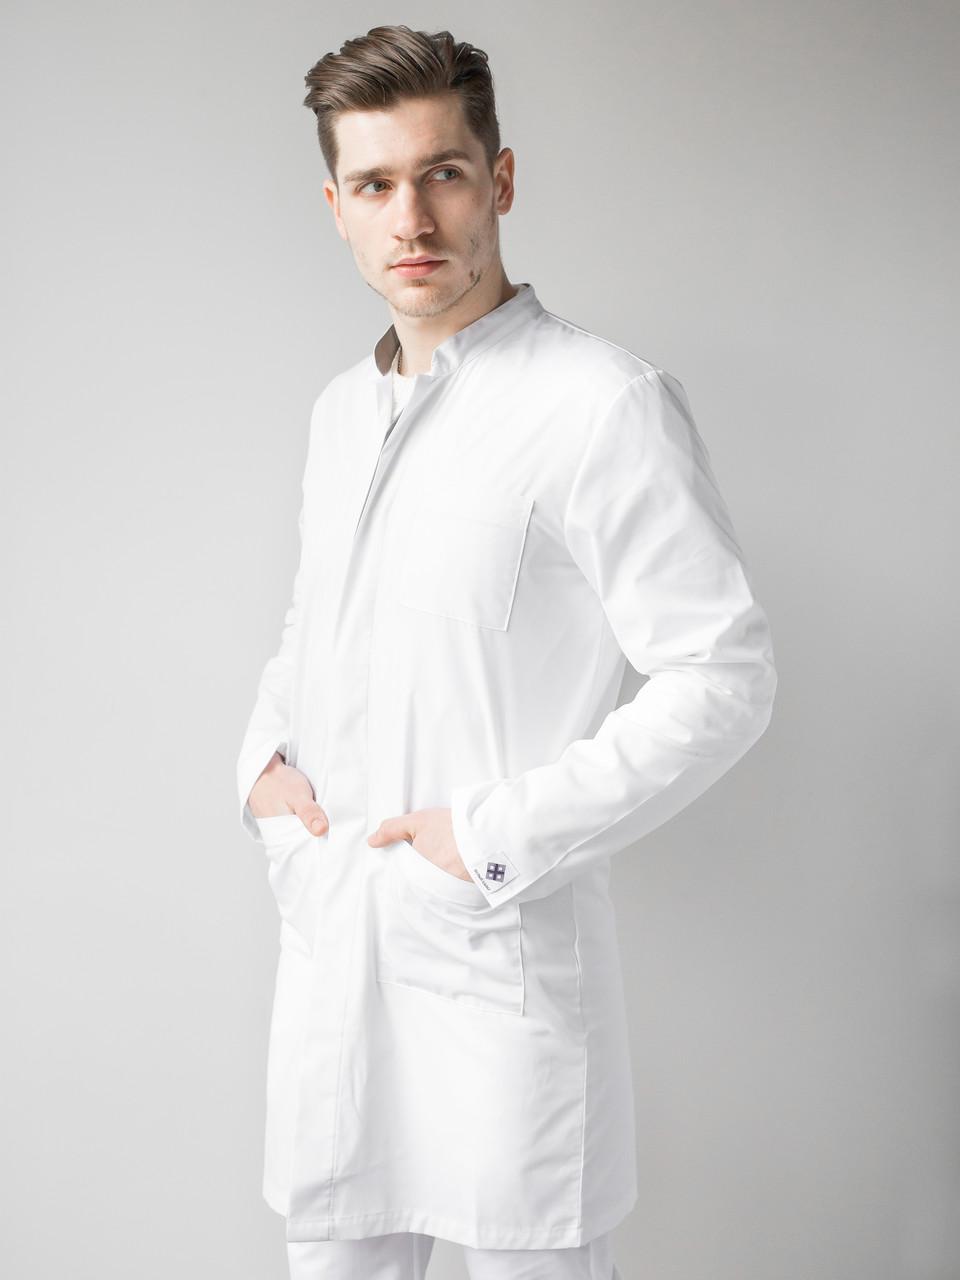 Медицинский мужской халат Амстердам белый-серый